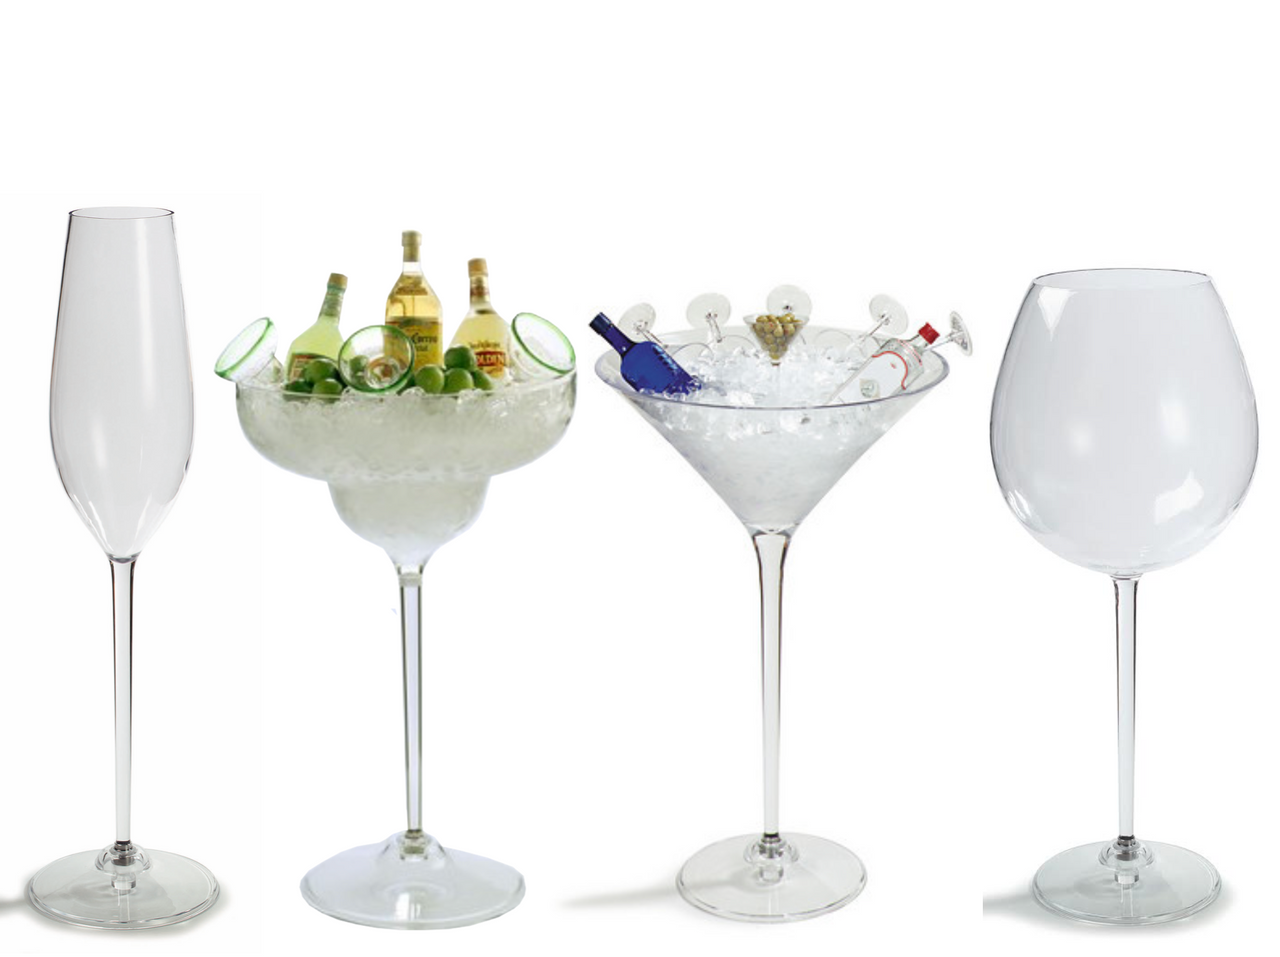 Variety, Jumbo, Drinks, Champagne, Flute, Margarita, Martini, Red, Wine, Cups